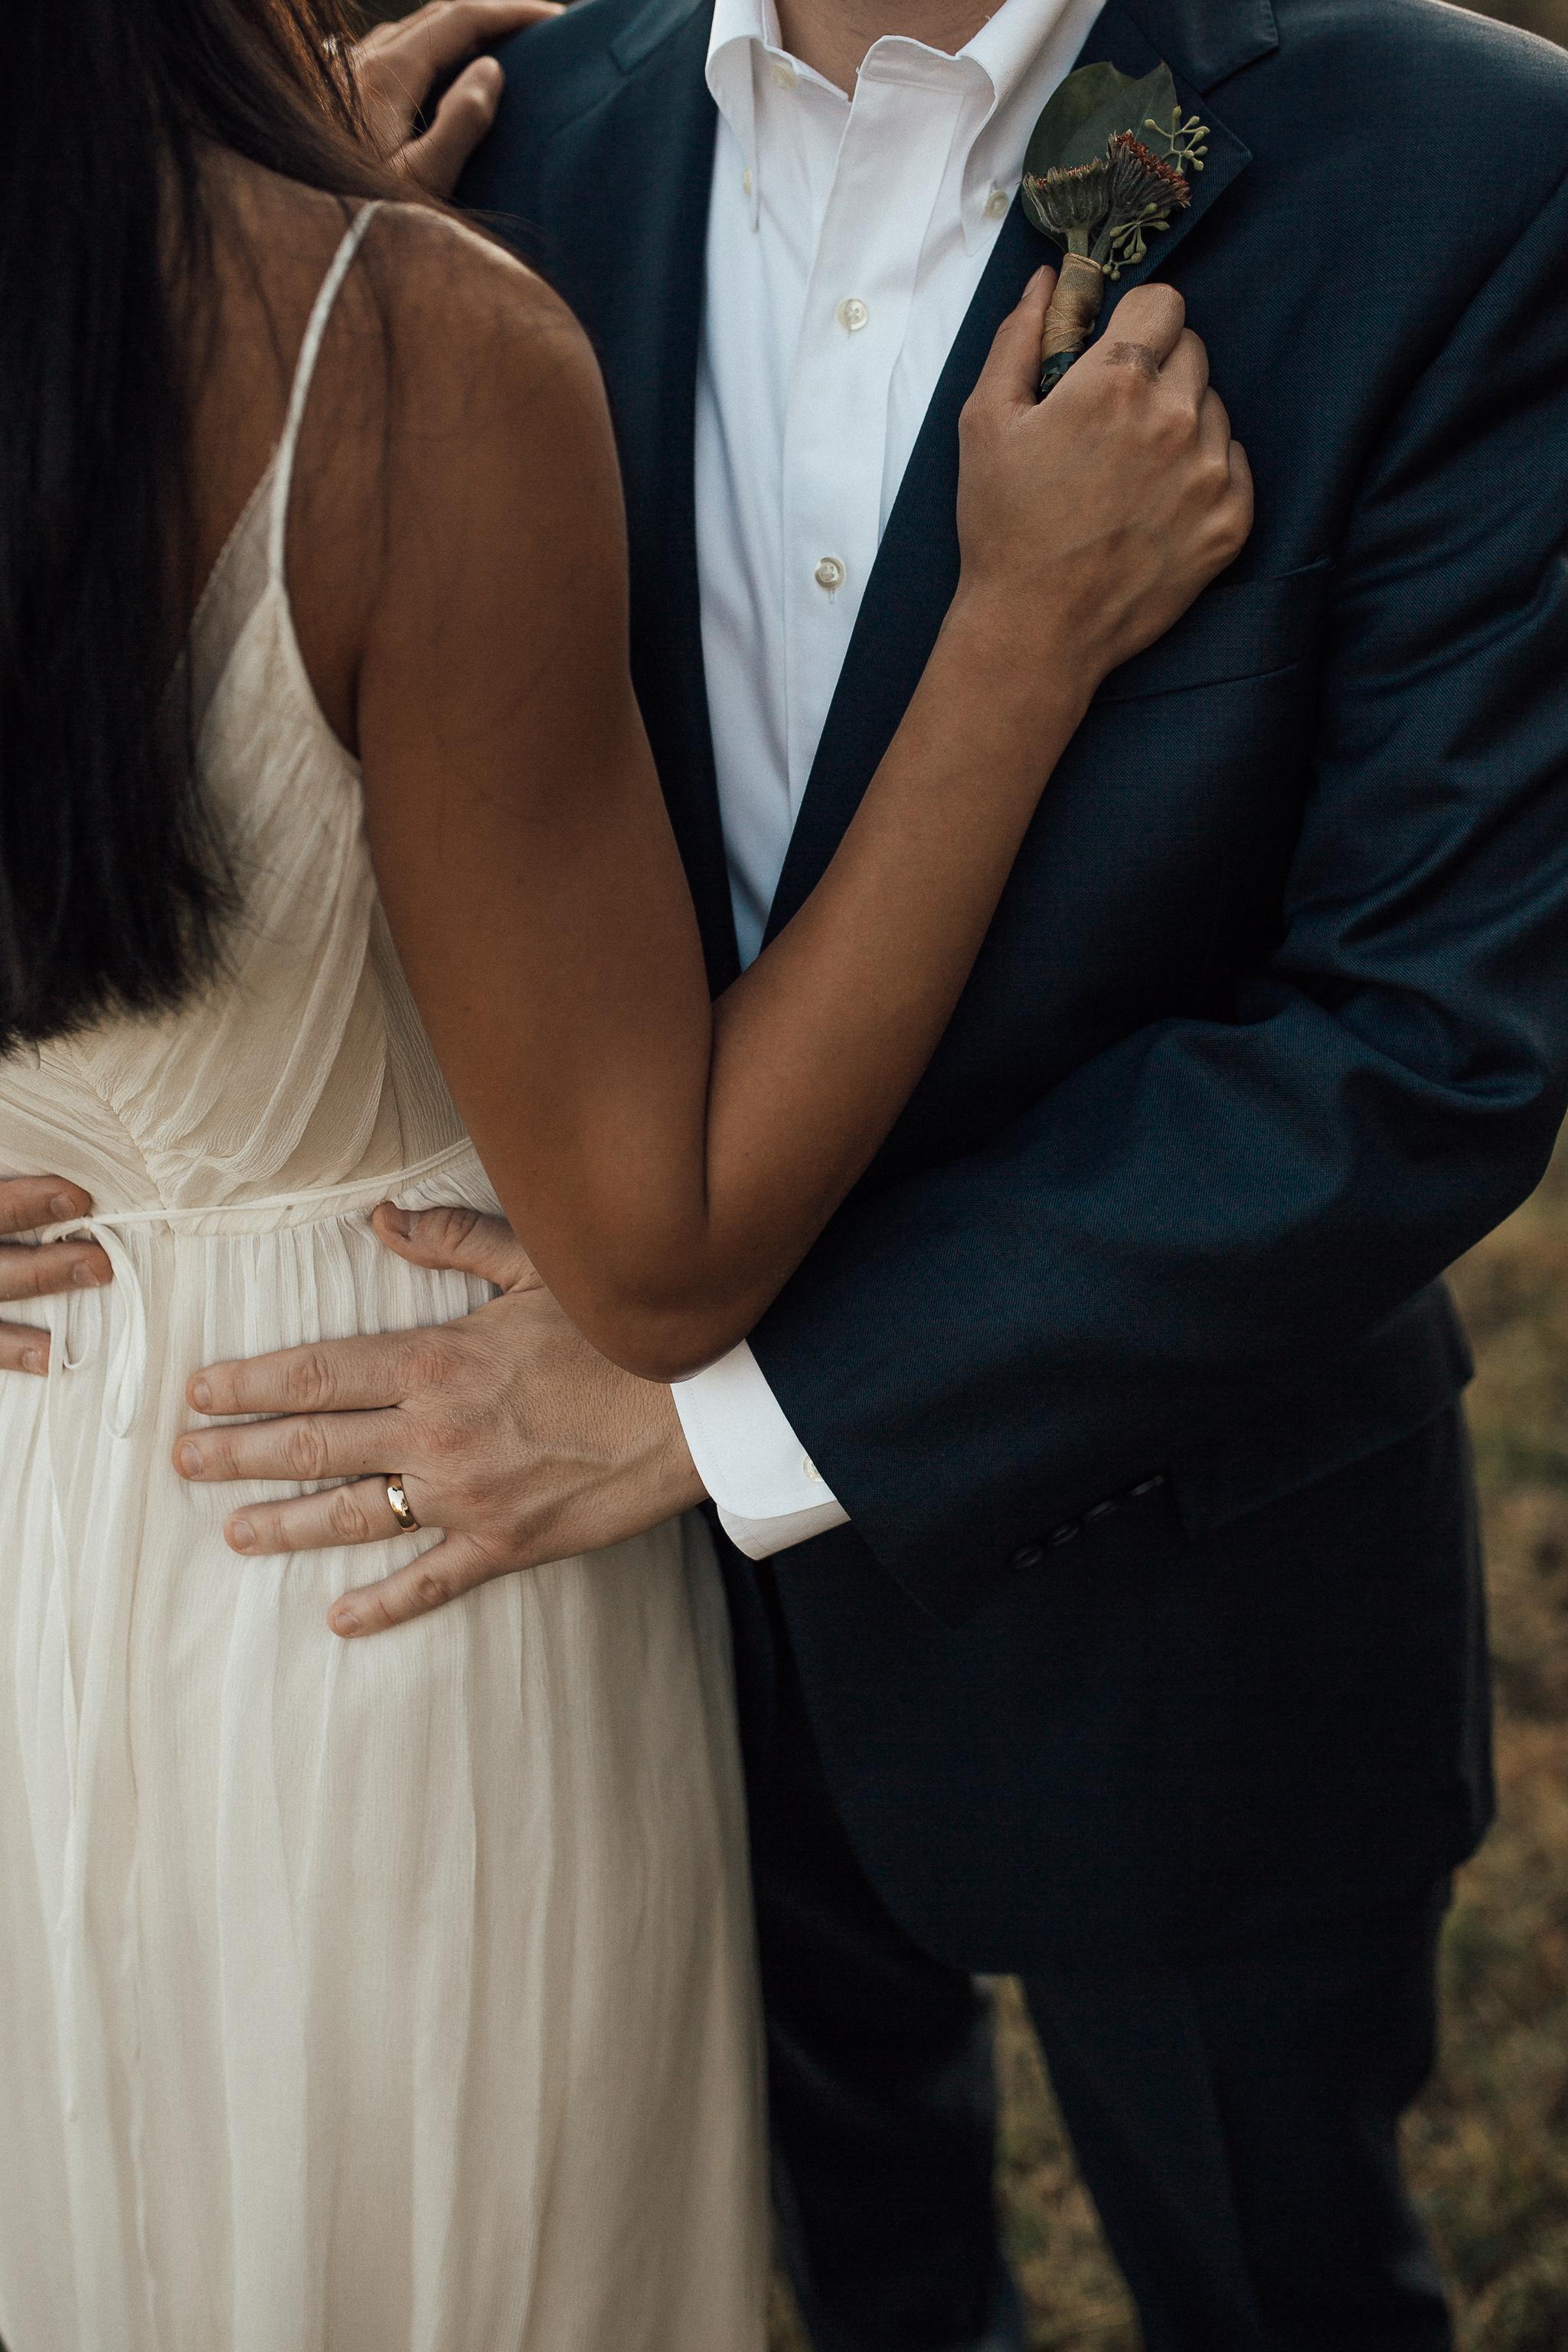 memphis-wedding-photographer-chattanooga-wedding-photographer-cassie-cook-photography-newly-engaged